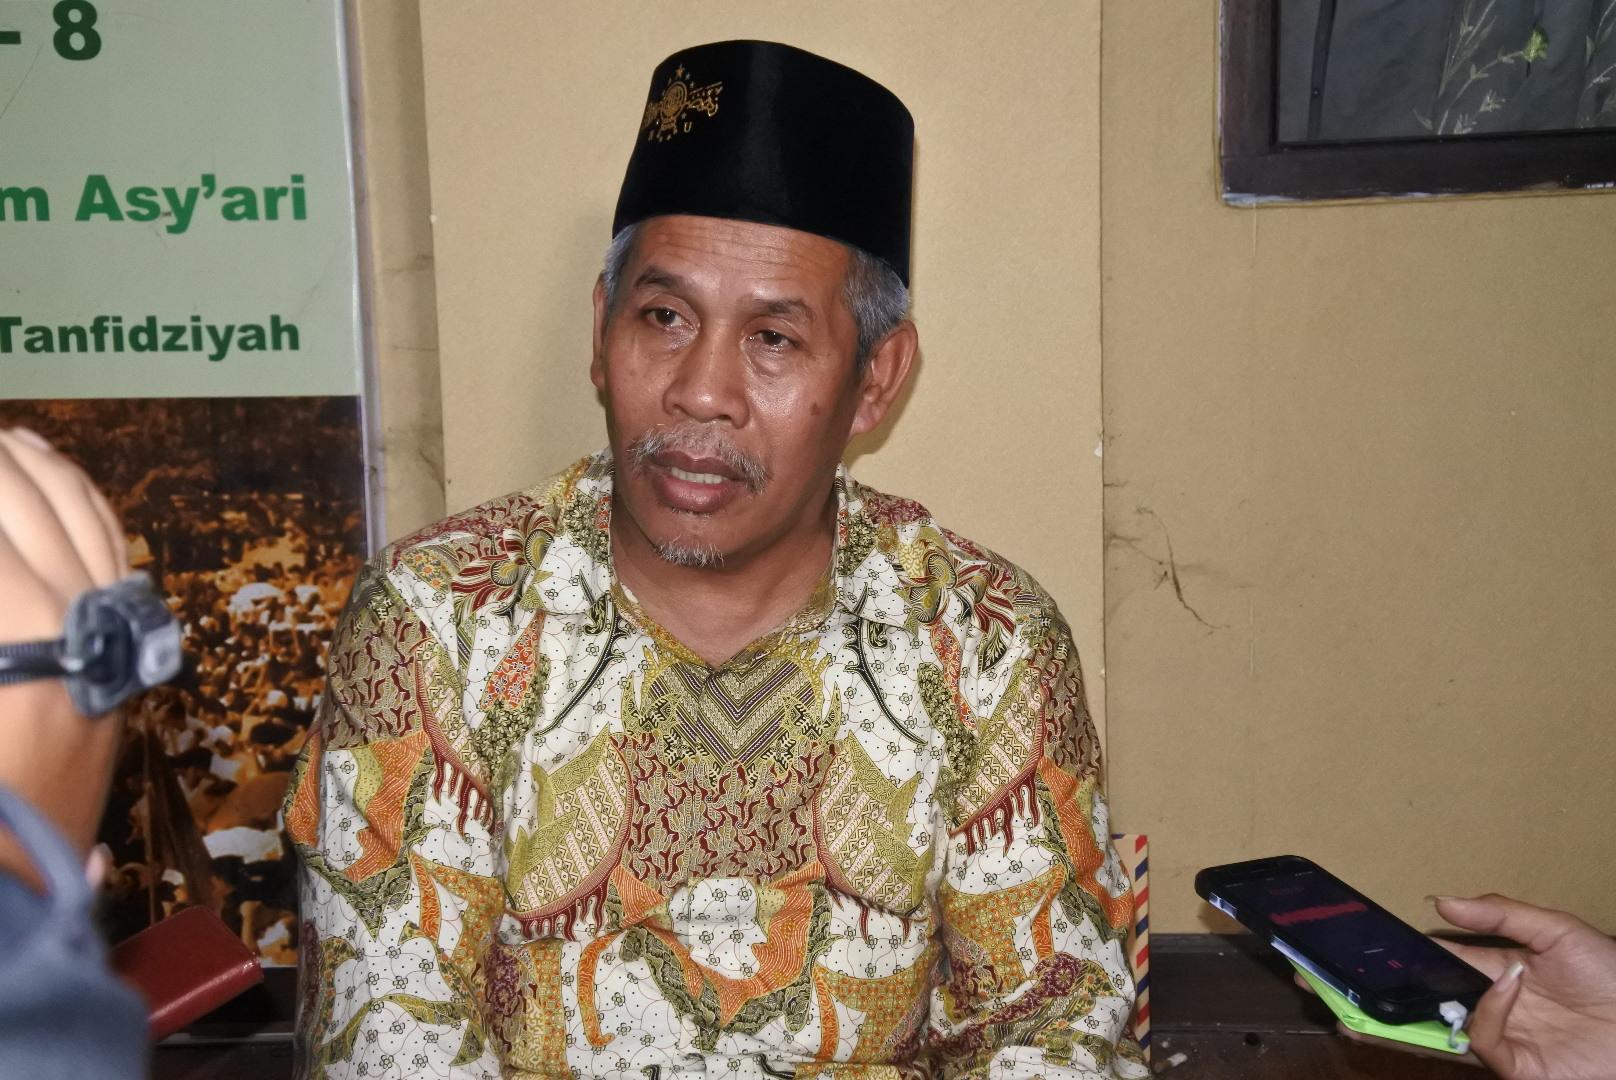 Ketua PWNU Jatim : Gak Pantes Kiai Mantu, Santri Gak Buwuh